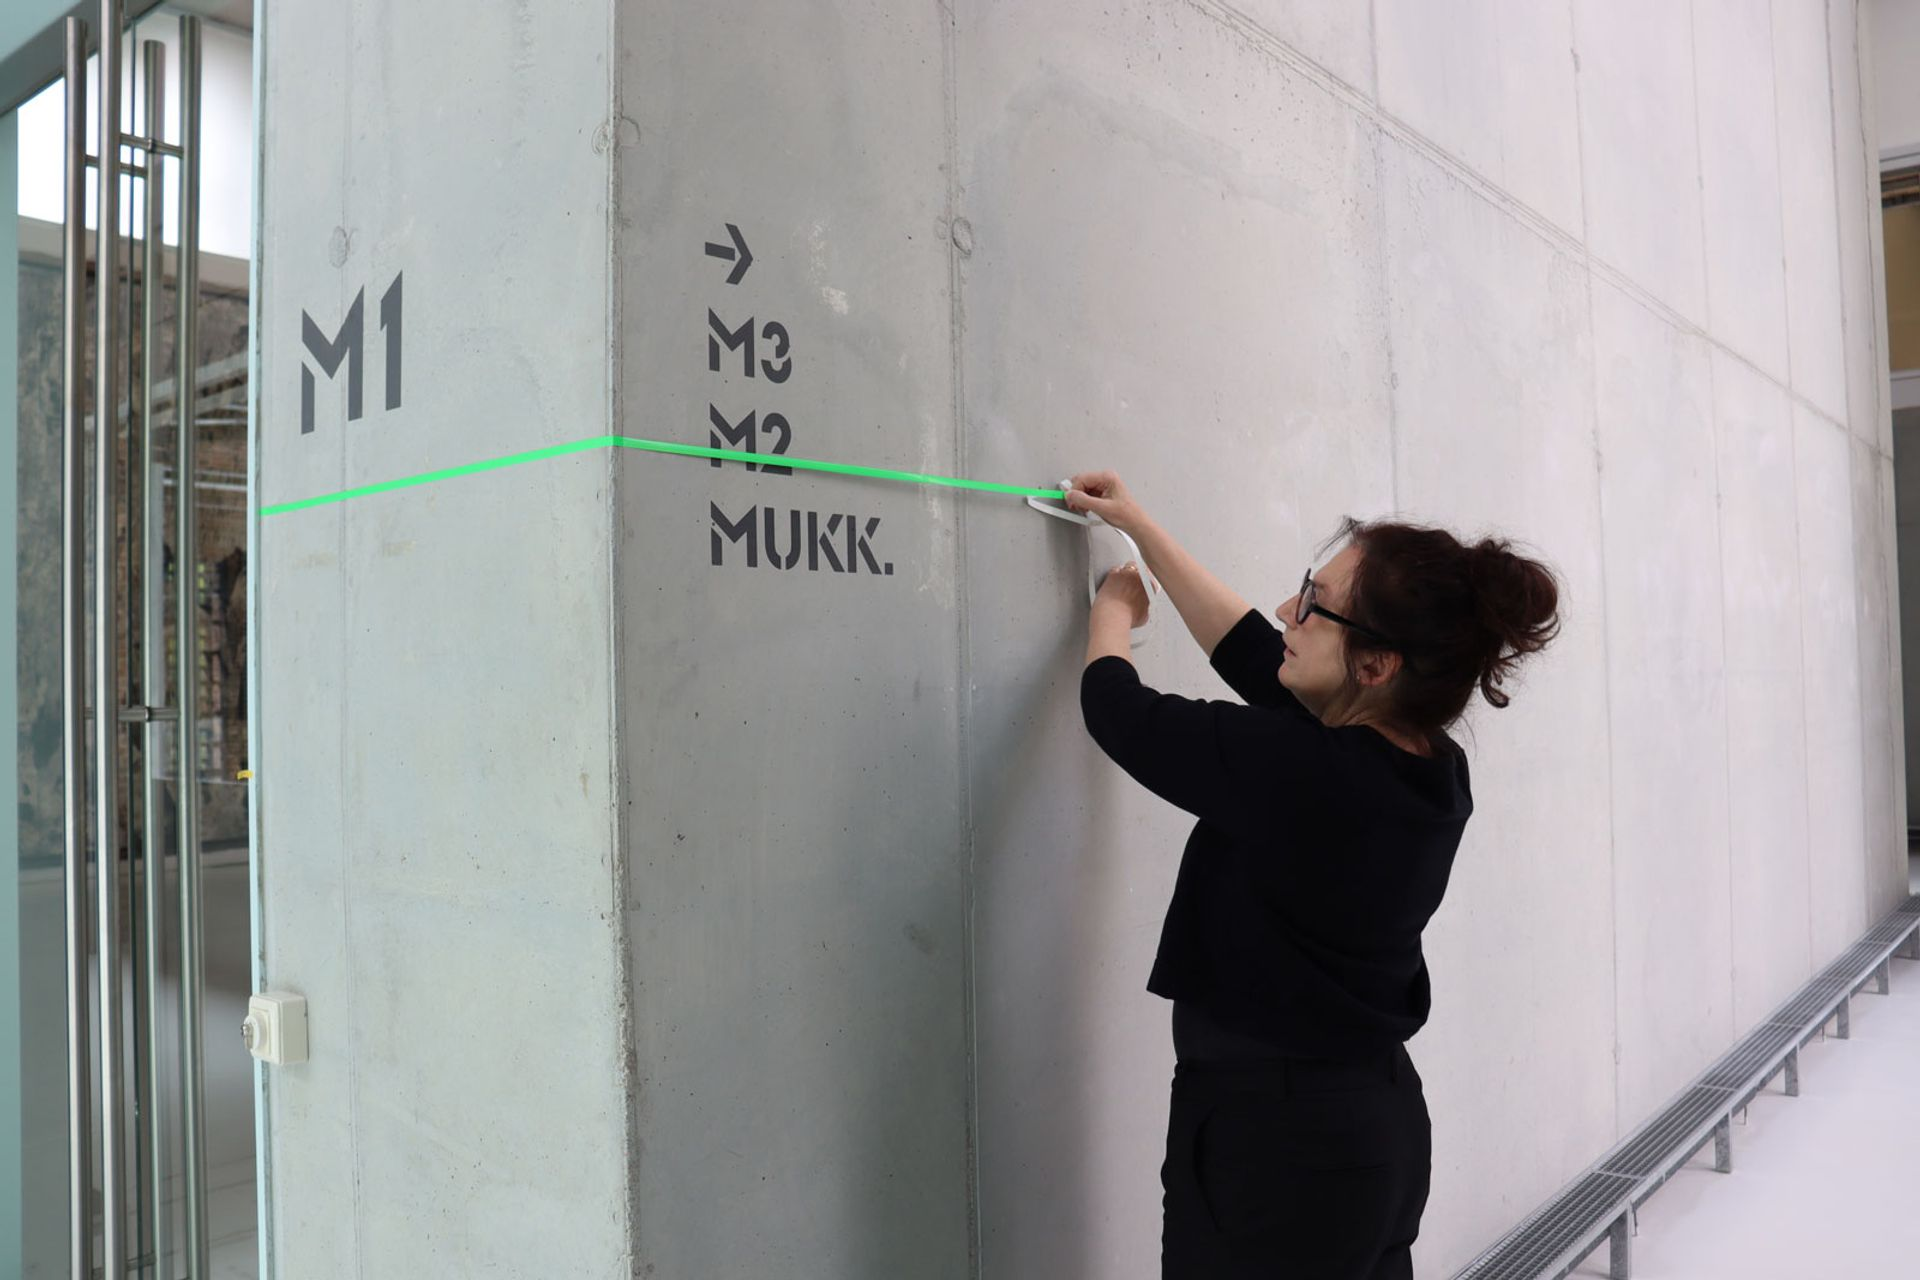 The Brandenburg museum's director Ulrike Kremeier working out social distancing measures © Blmk